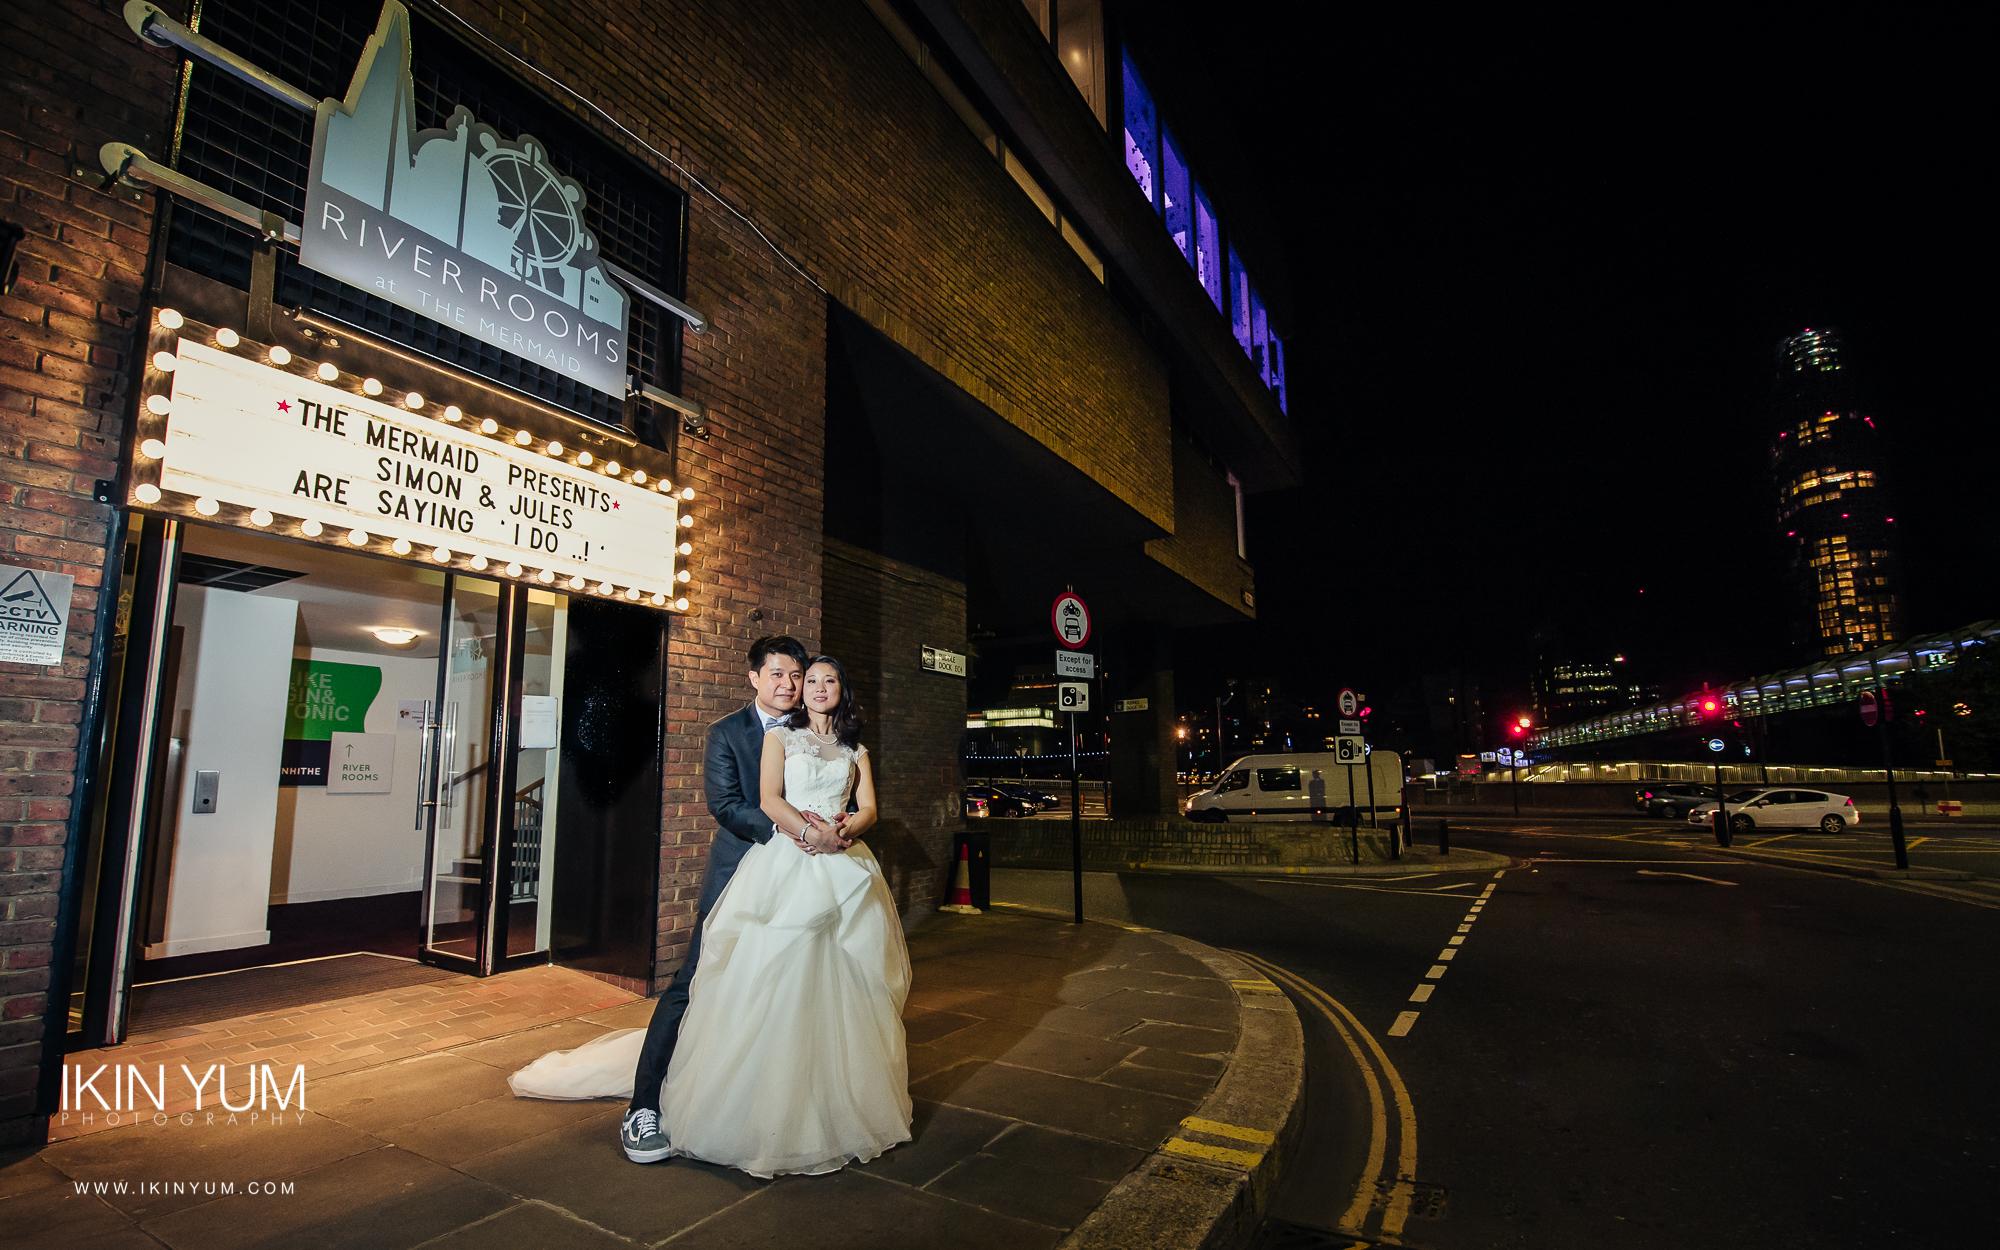 Mermaid river rooms Wedding - Ikin Yum Photography-124.jpg